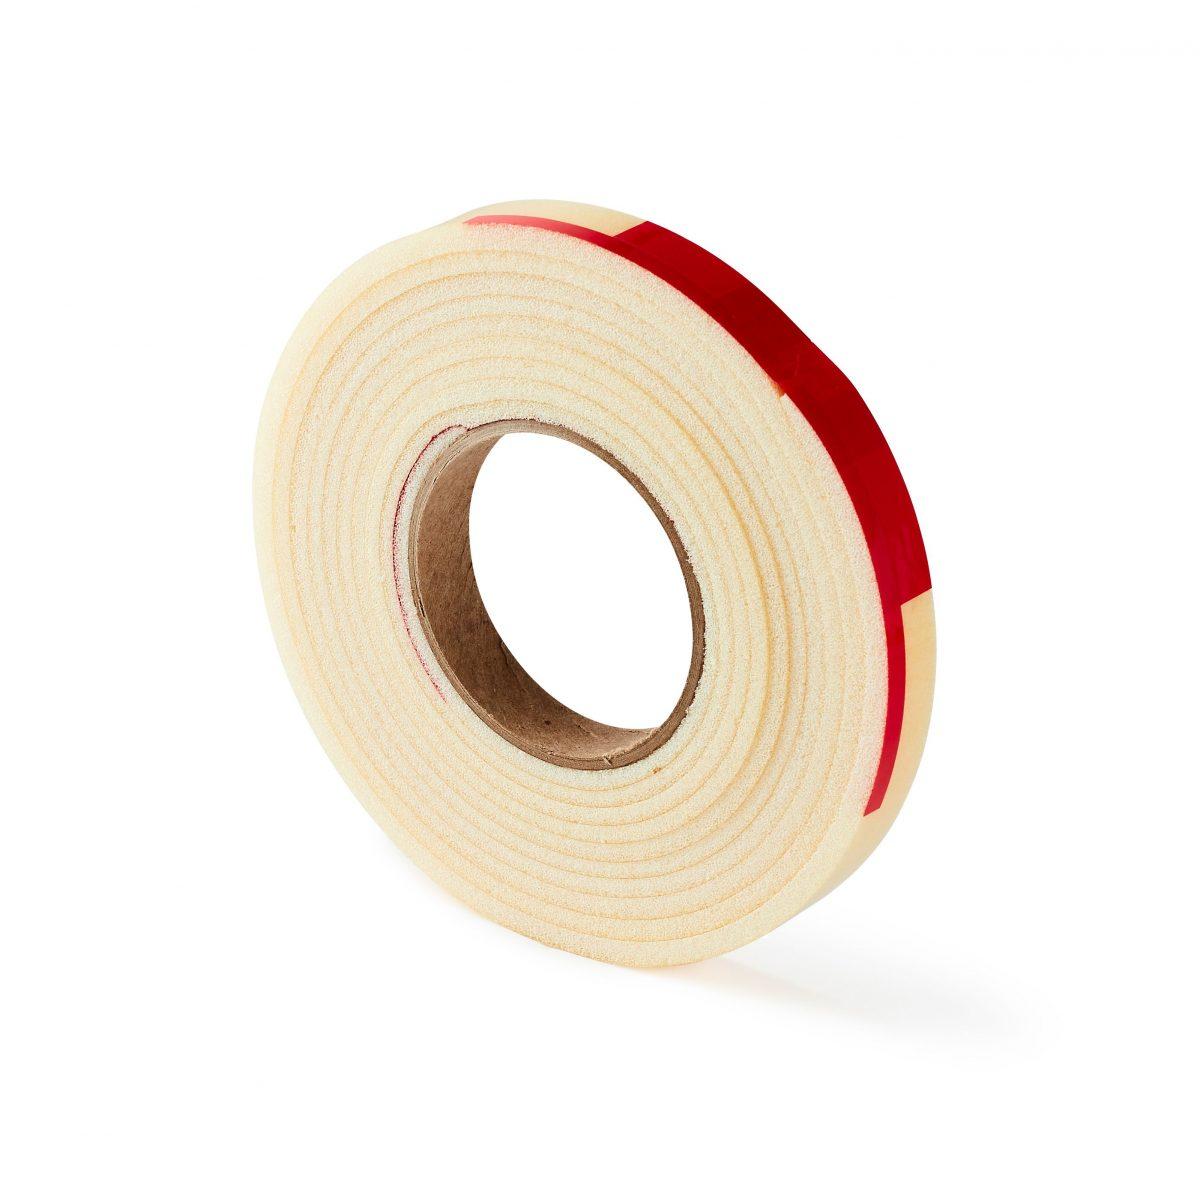 Electrically Conductive Foam Tape